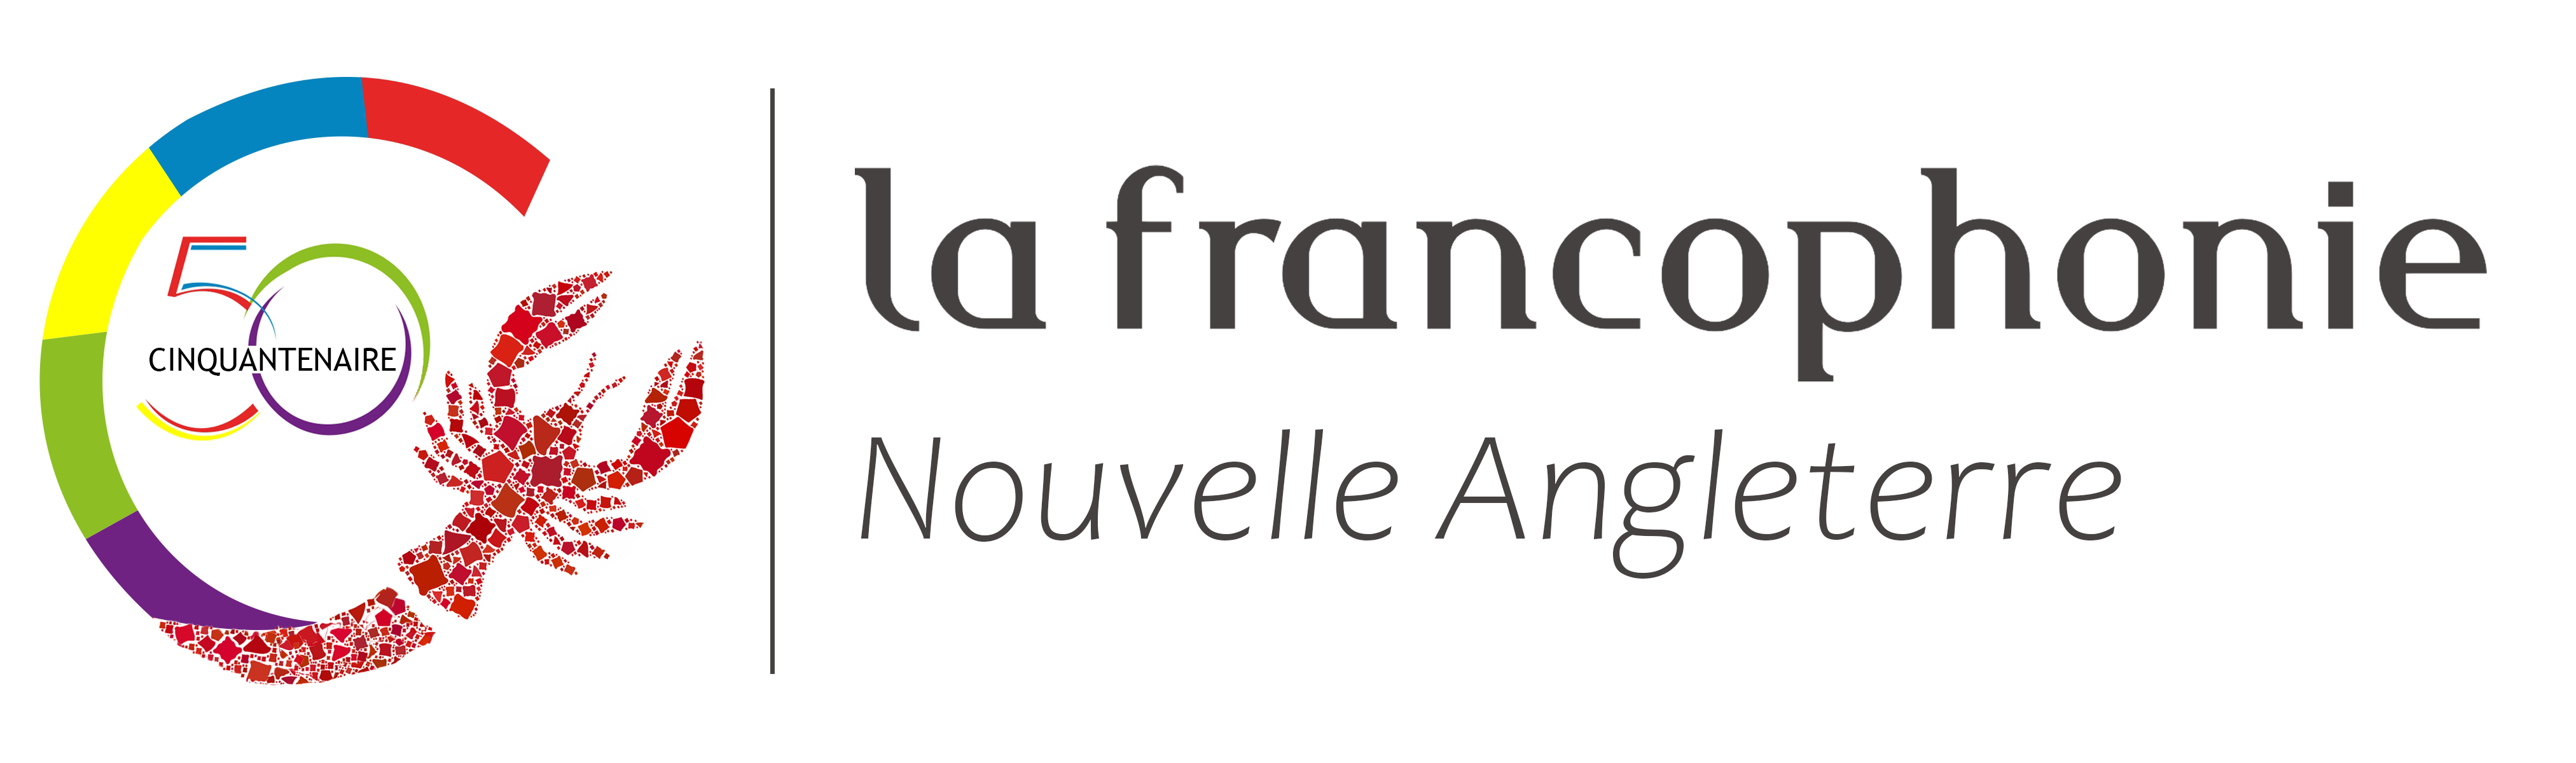 FrancophonieNA logo